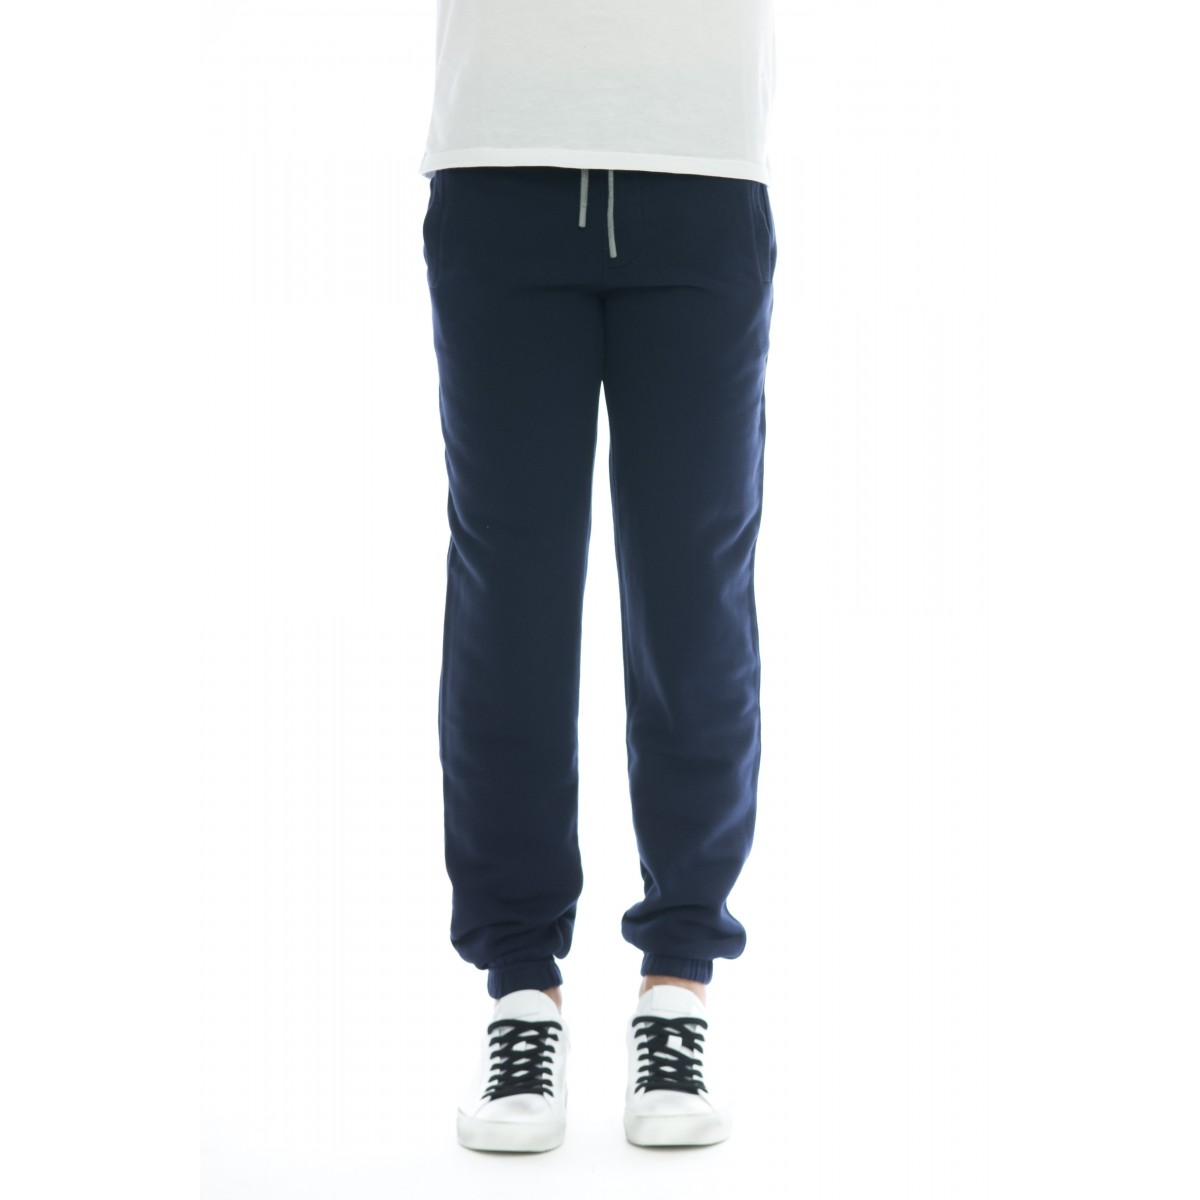 Pantalone uomo - F30124 pantalone jogging